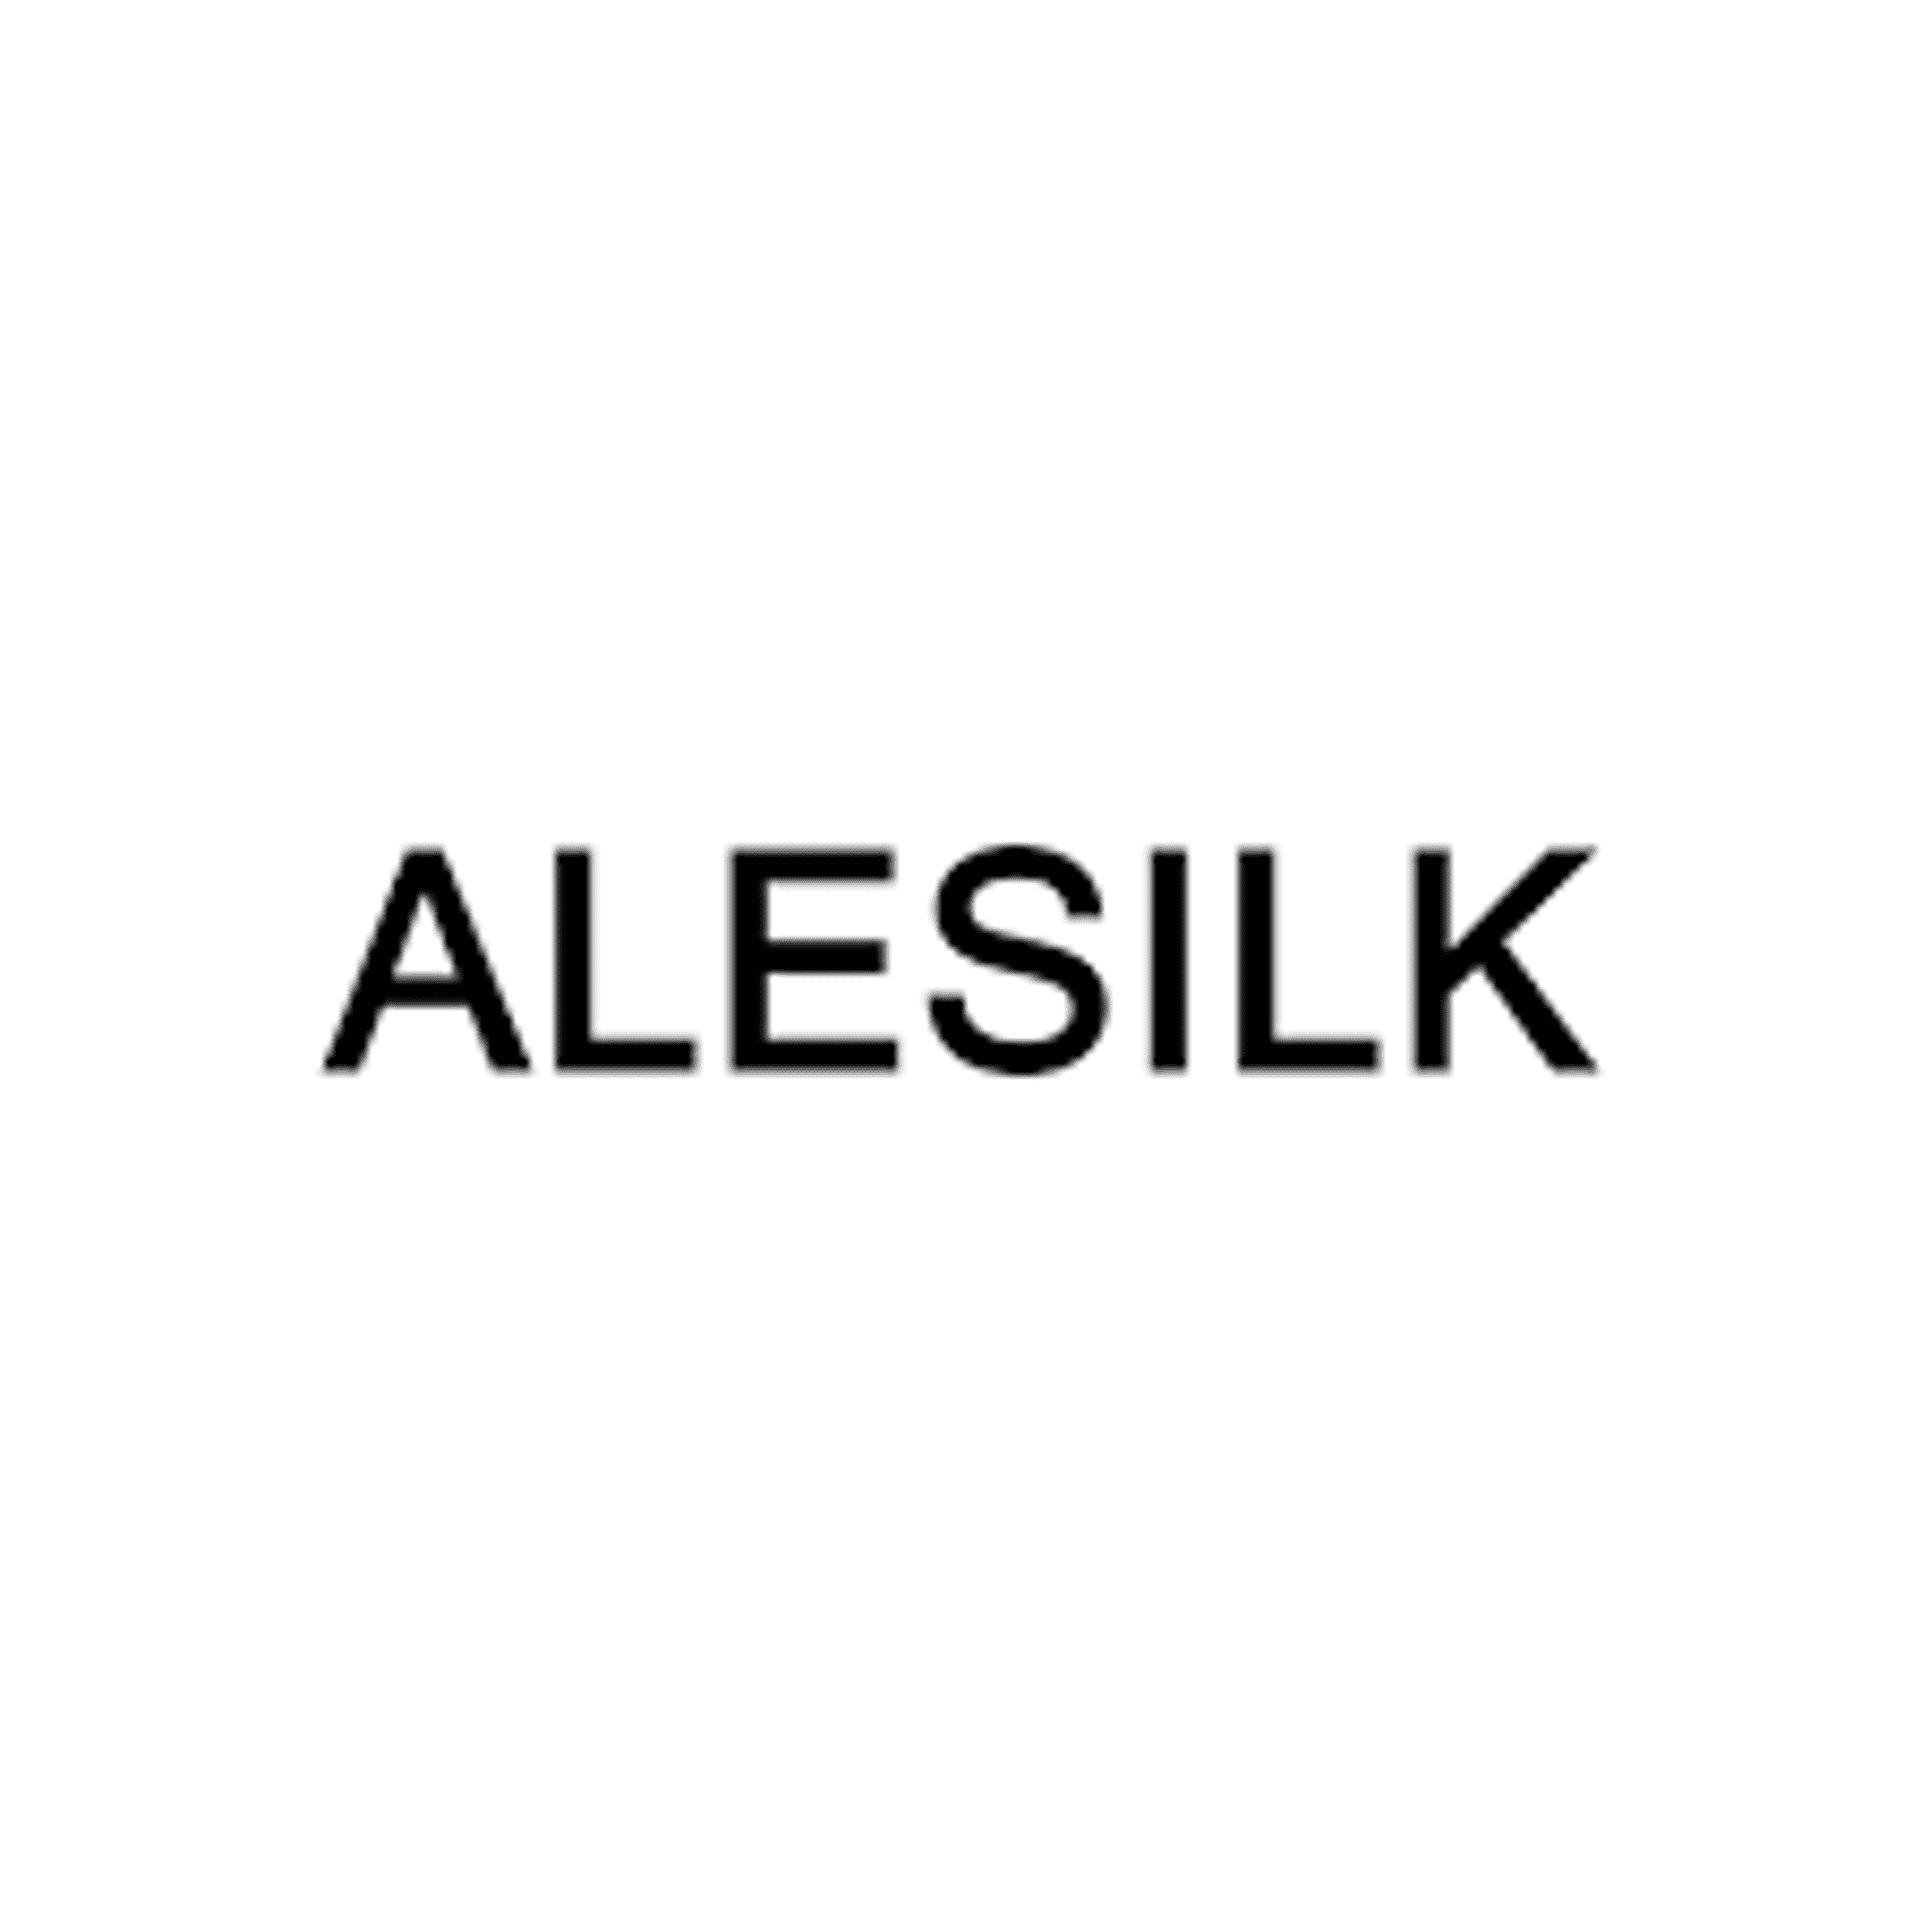 Sponsor tony arbolino, Alesilk